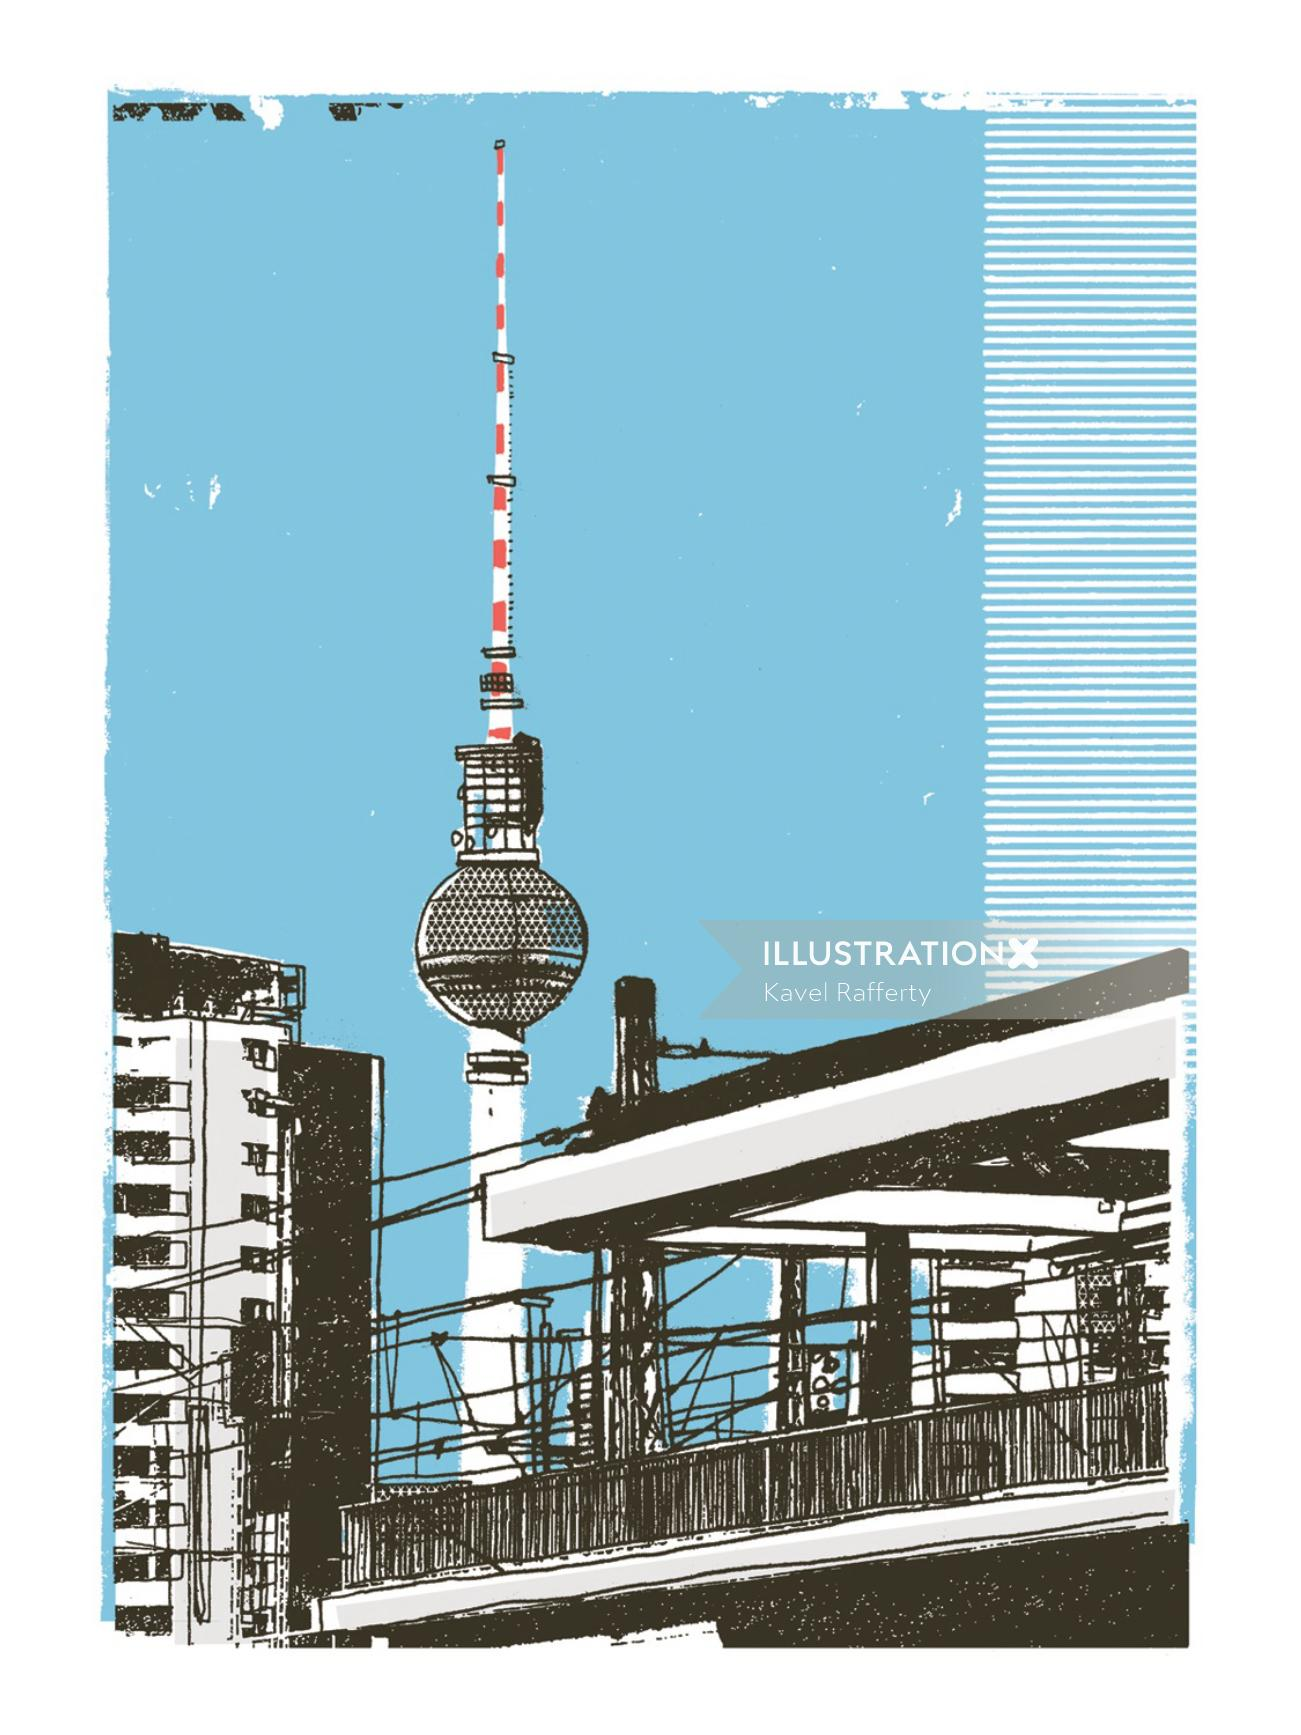 Fernsehturm Berlin mixed media art